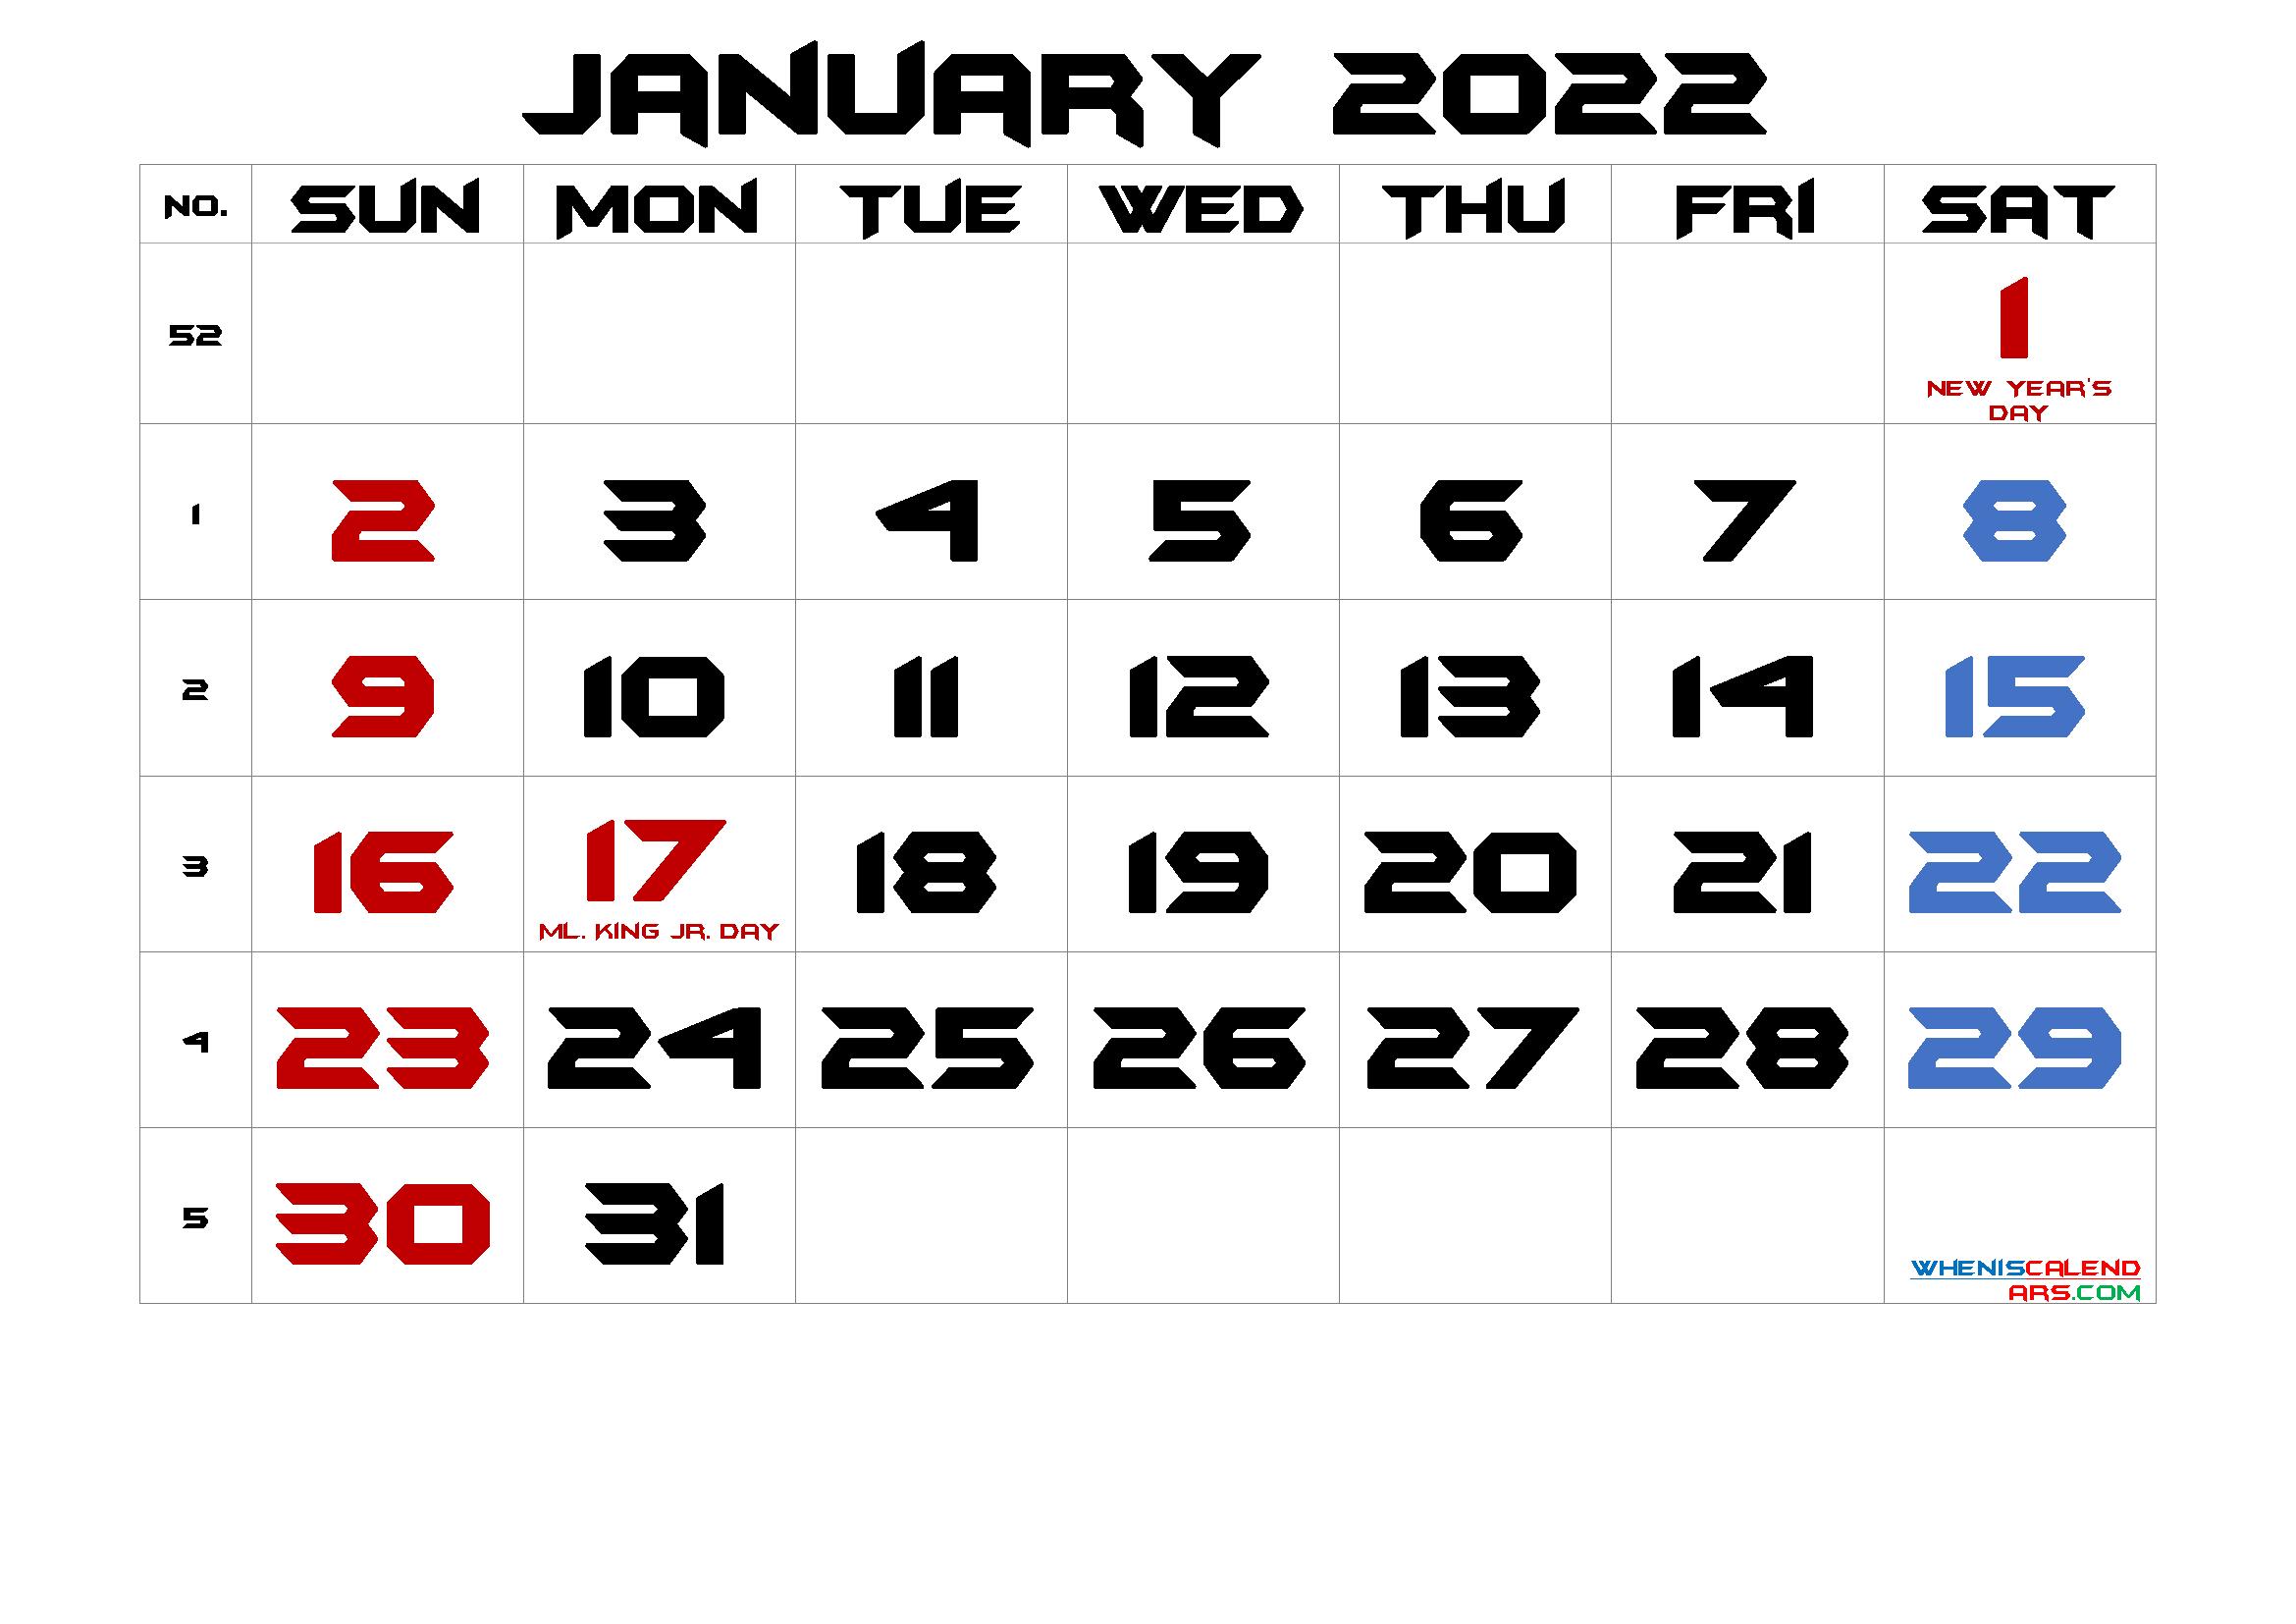 January 2022 Printable Calendar With Holidays pertaining to January 2022 Printable Calendar Photo